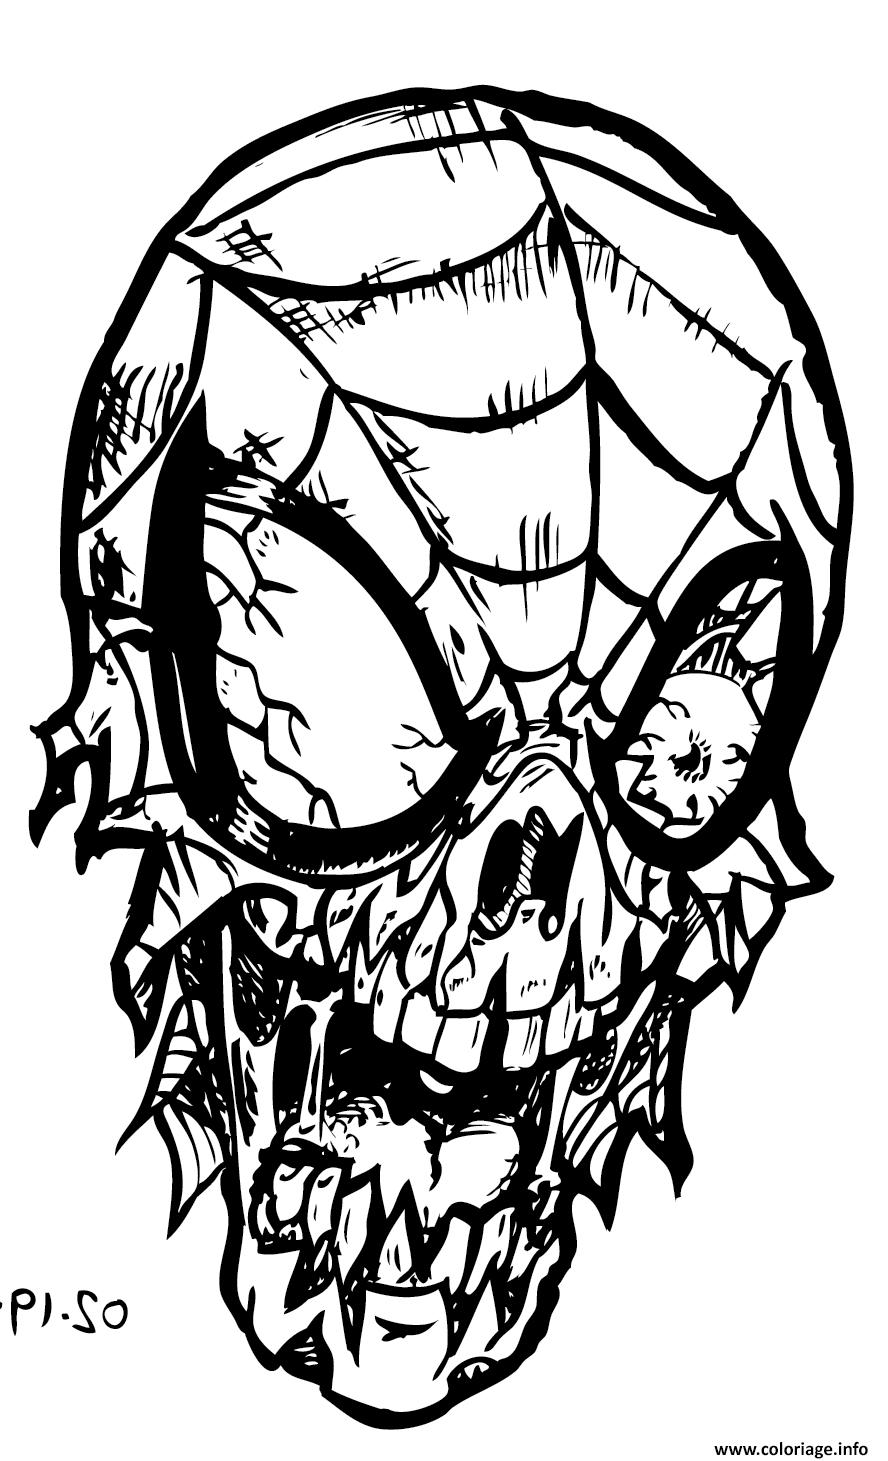 Coloriage Spiderman Zombie Dessin encequiconcerne Tete Spiderman A Imprimer